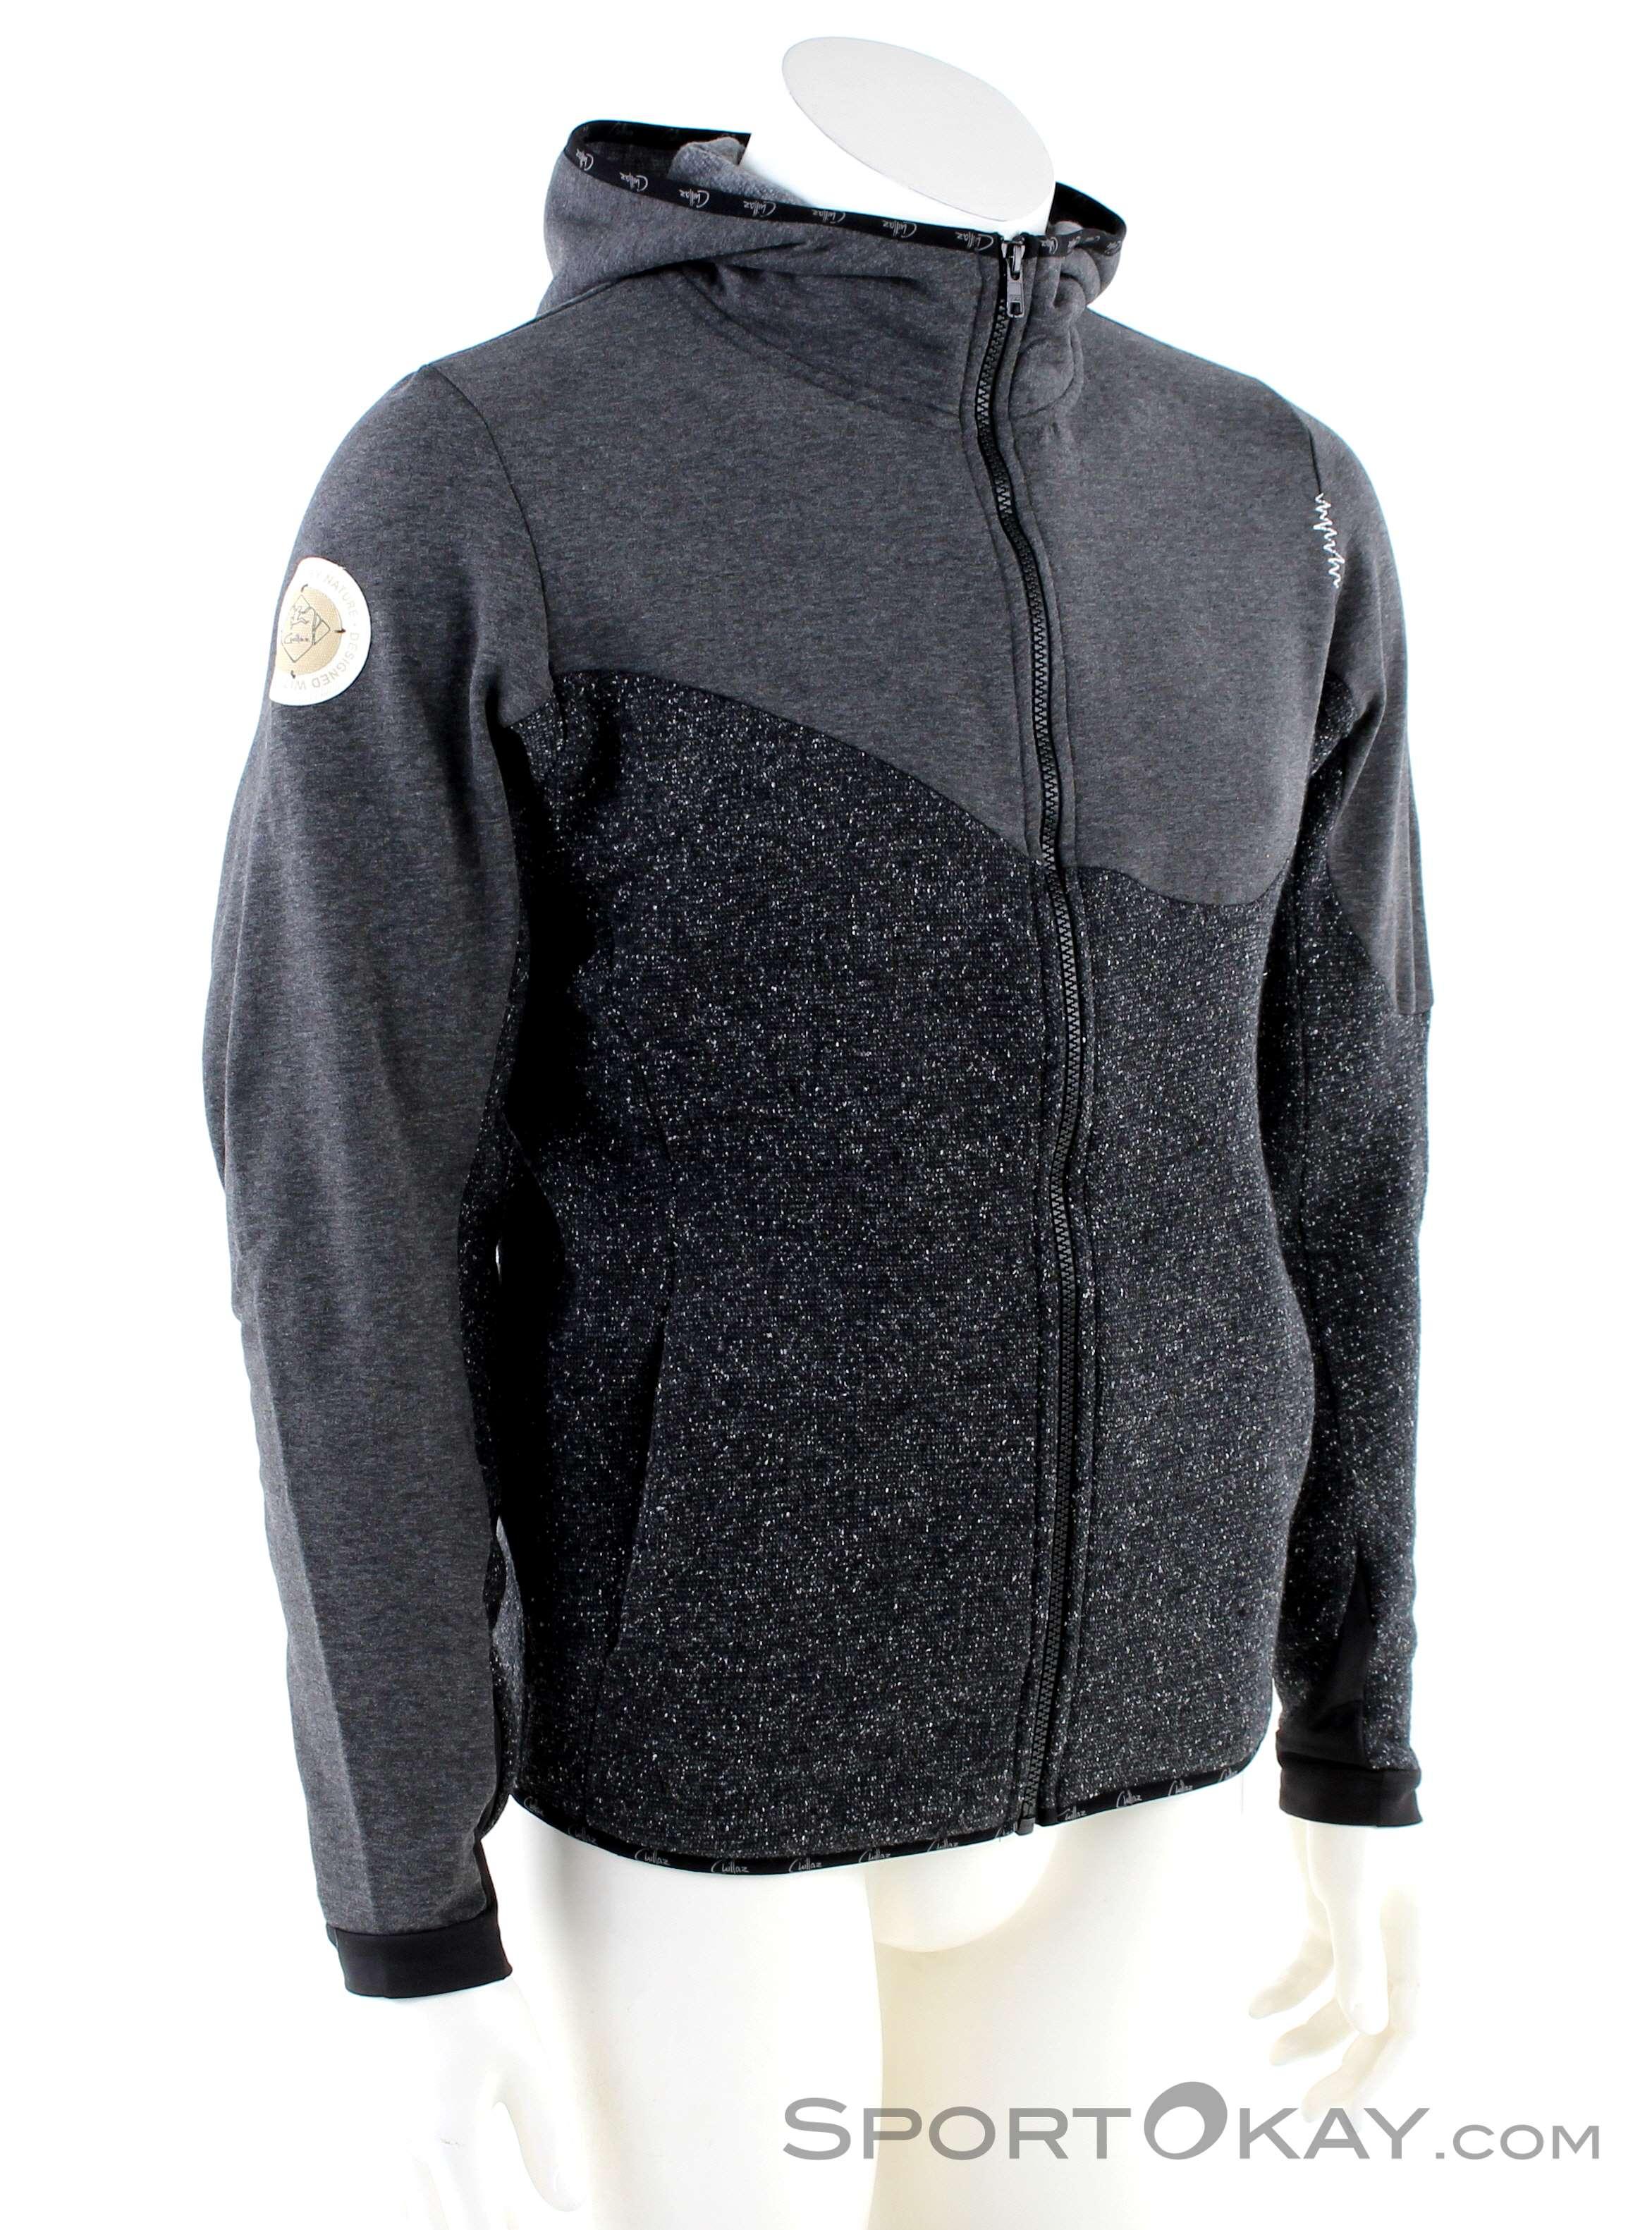 Sweater Mounty Mounty Jacket Herren Chillaz Chillaz n0OkP8wX